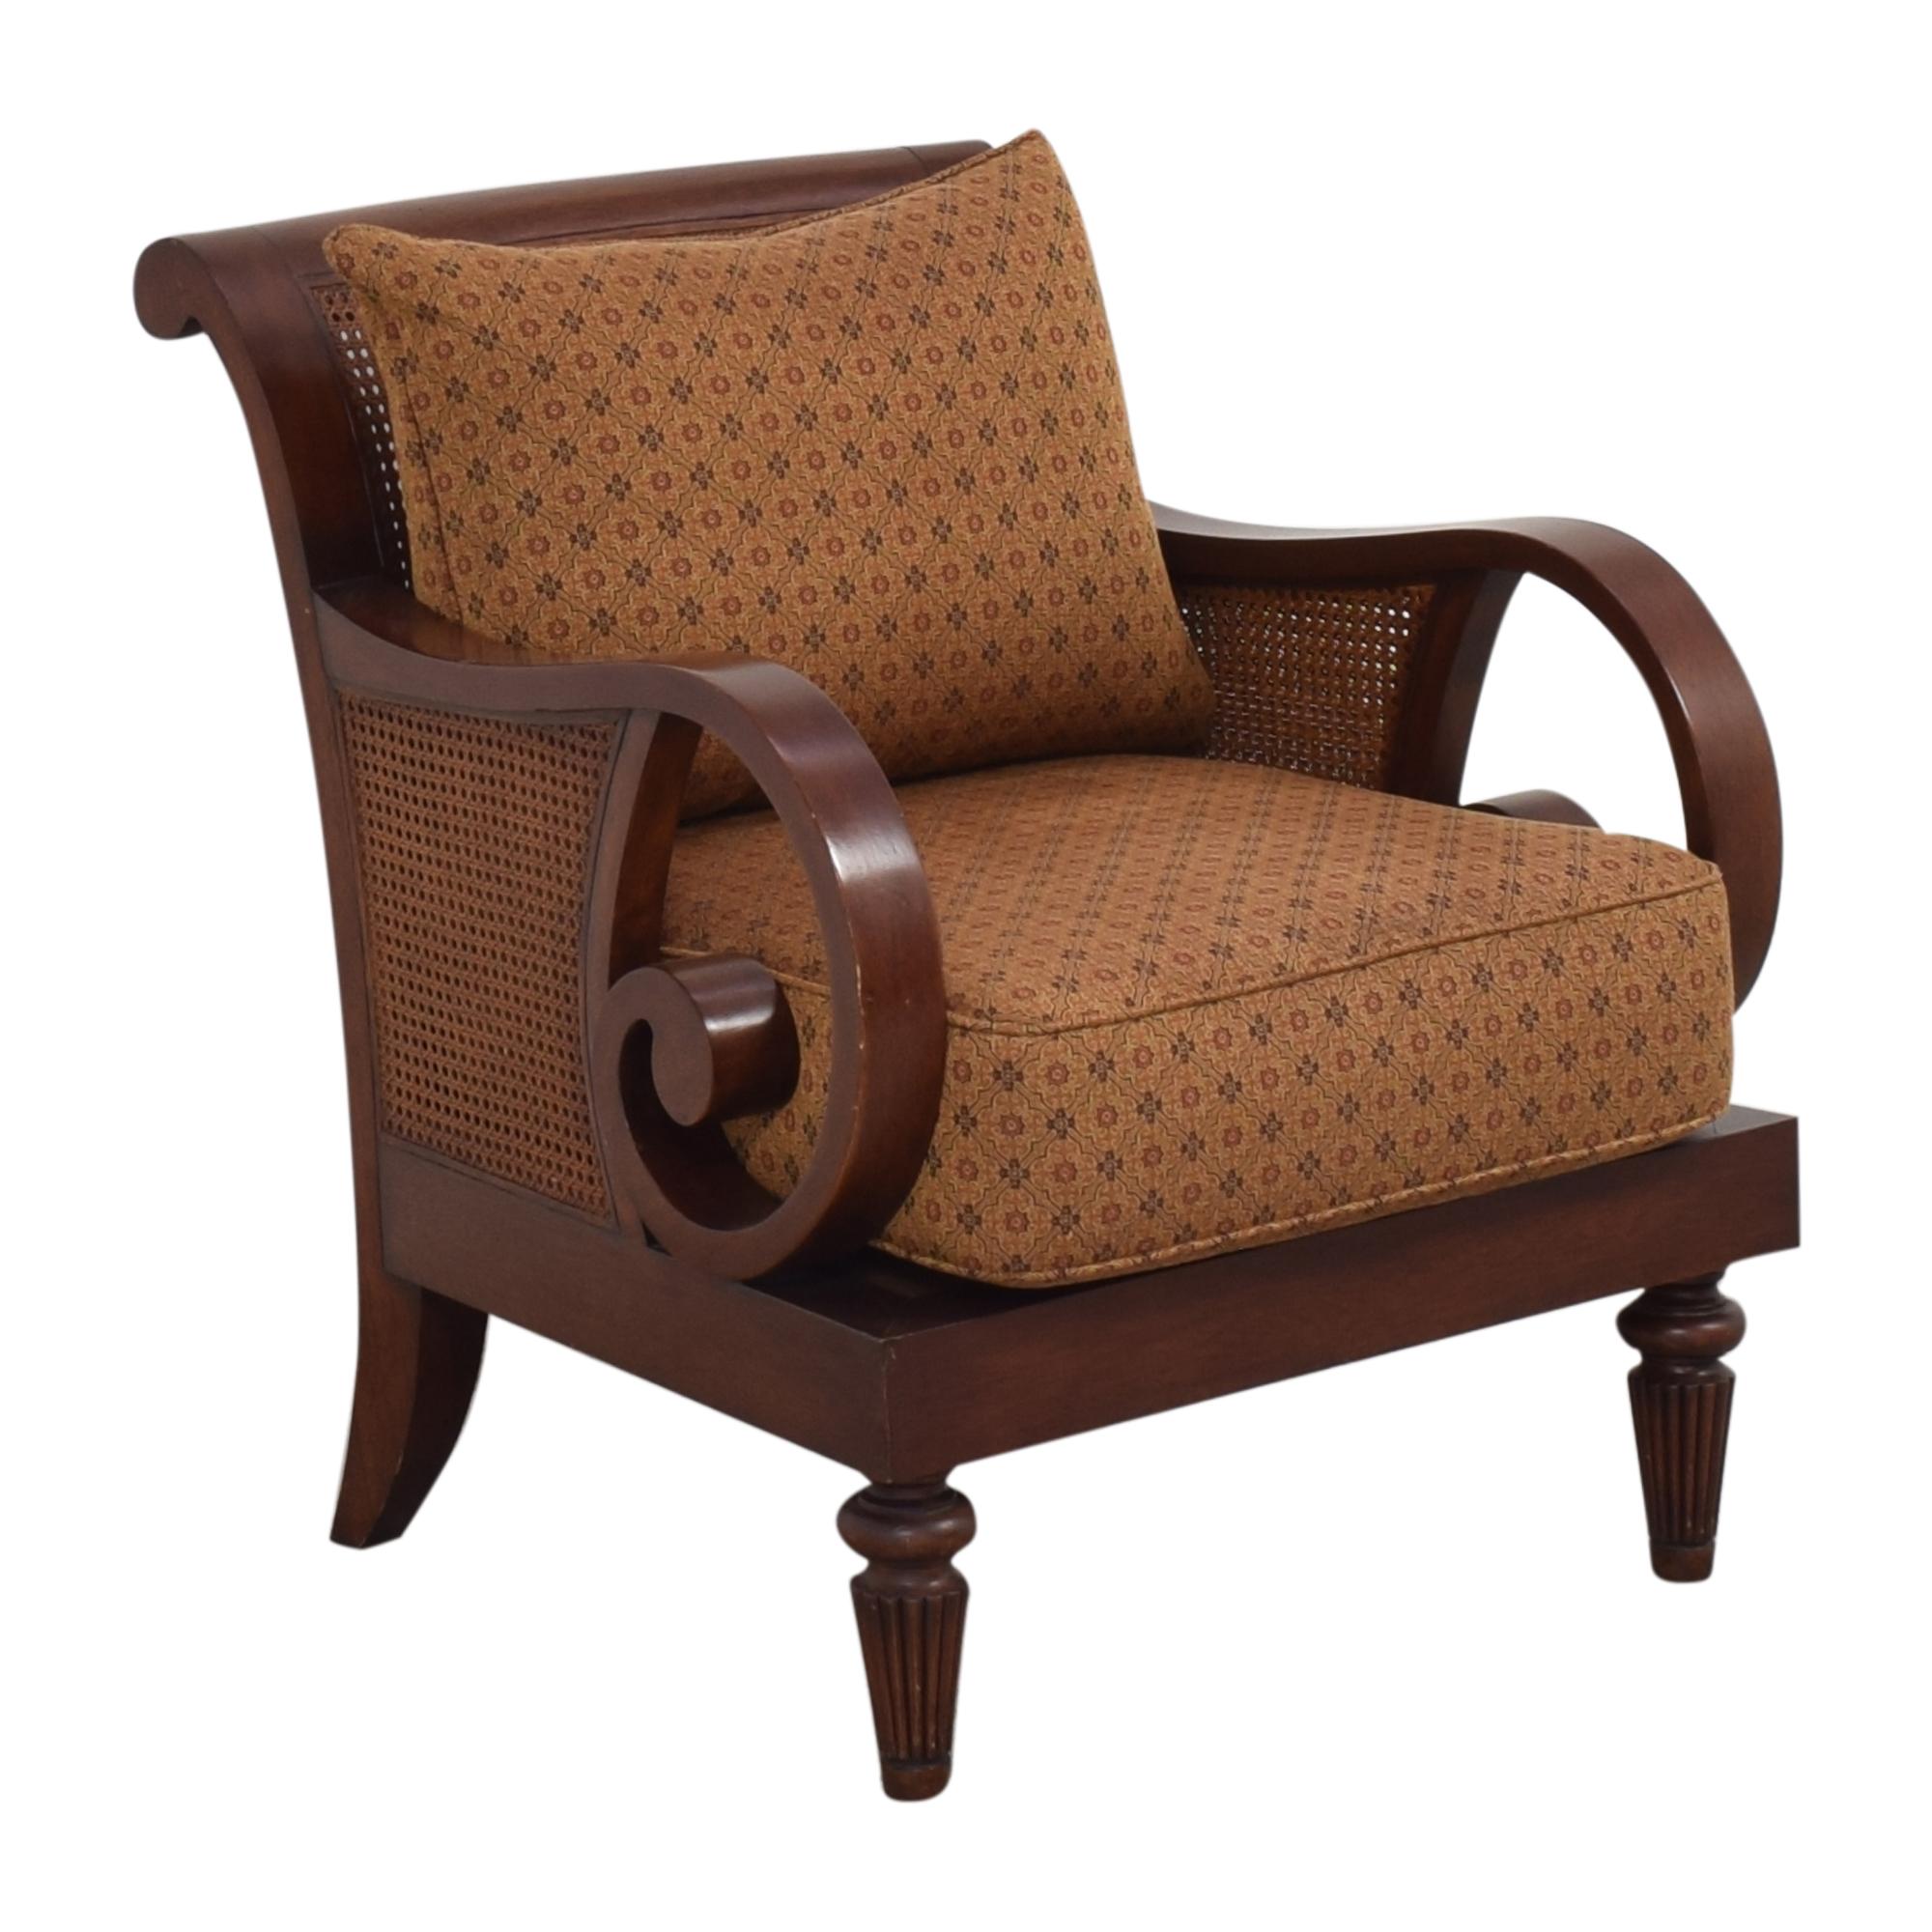 Ethan Allen Ethan Allen Berwick Chair for sale